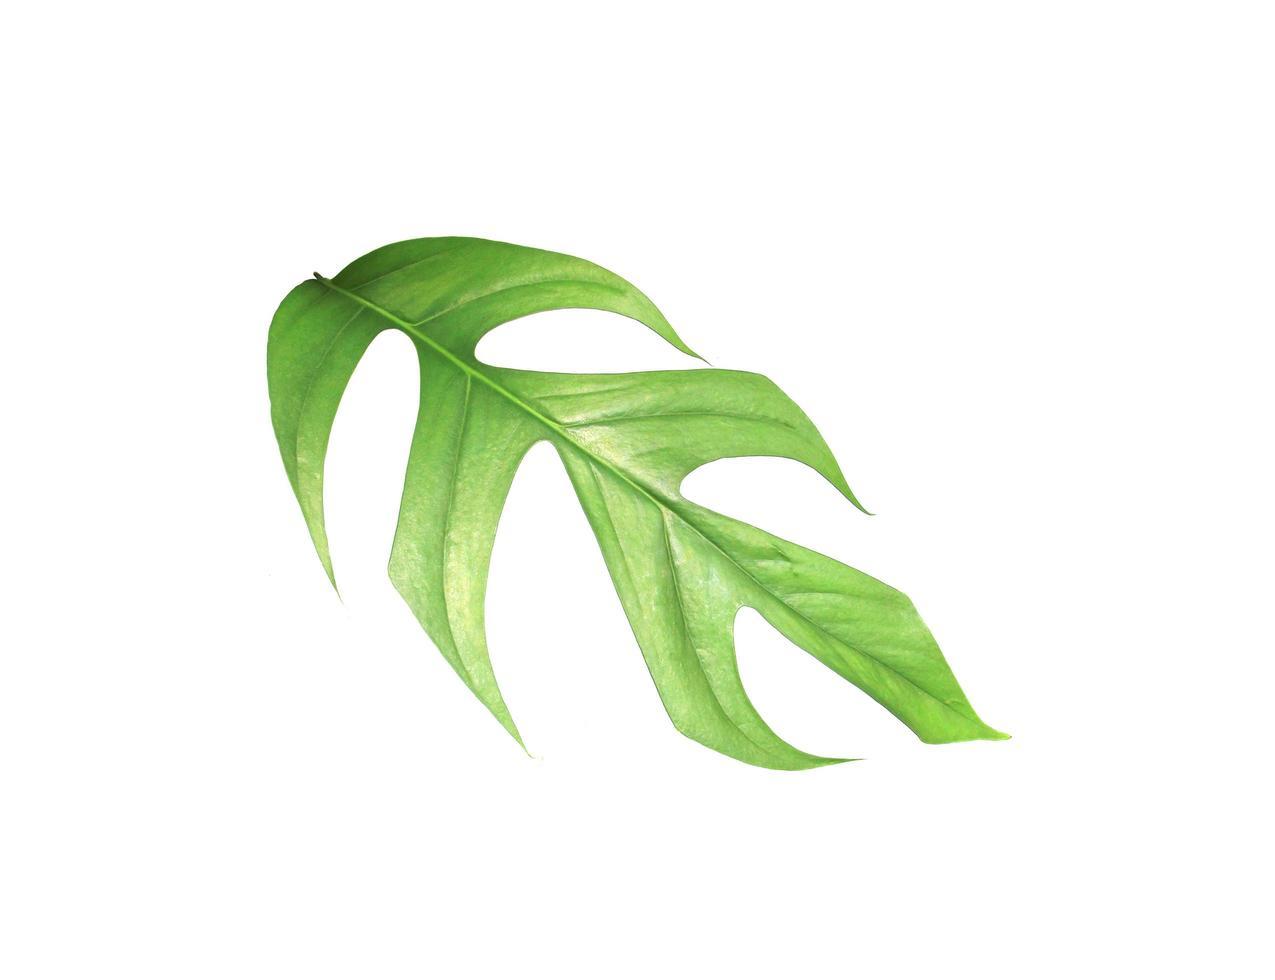 Green monstera leaf photo